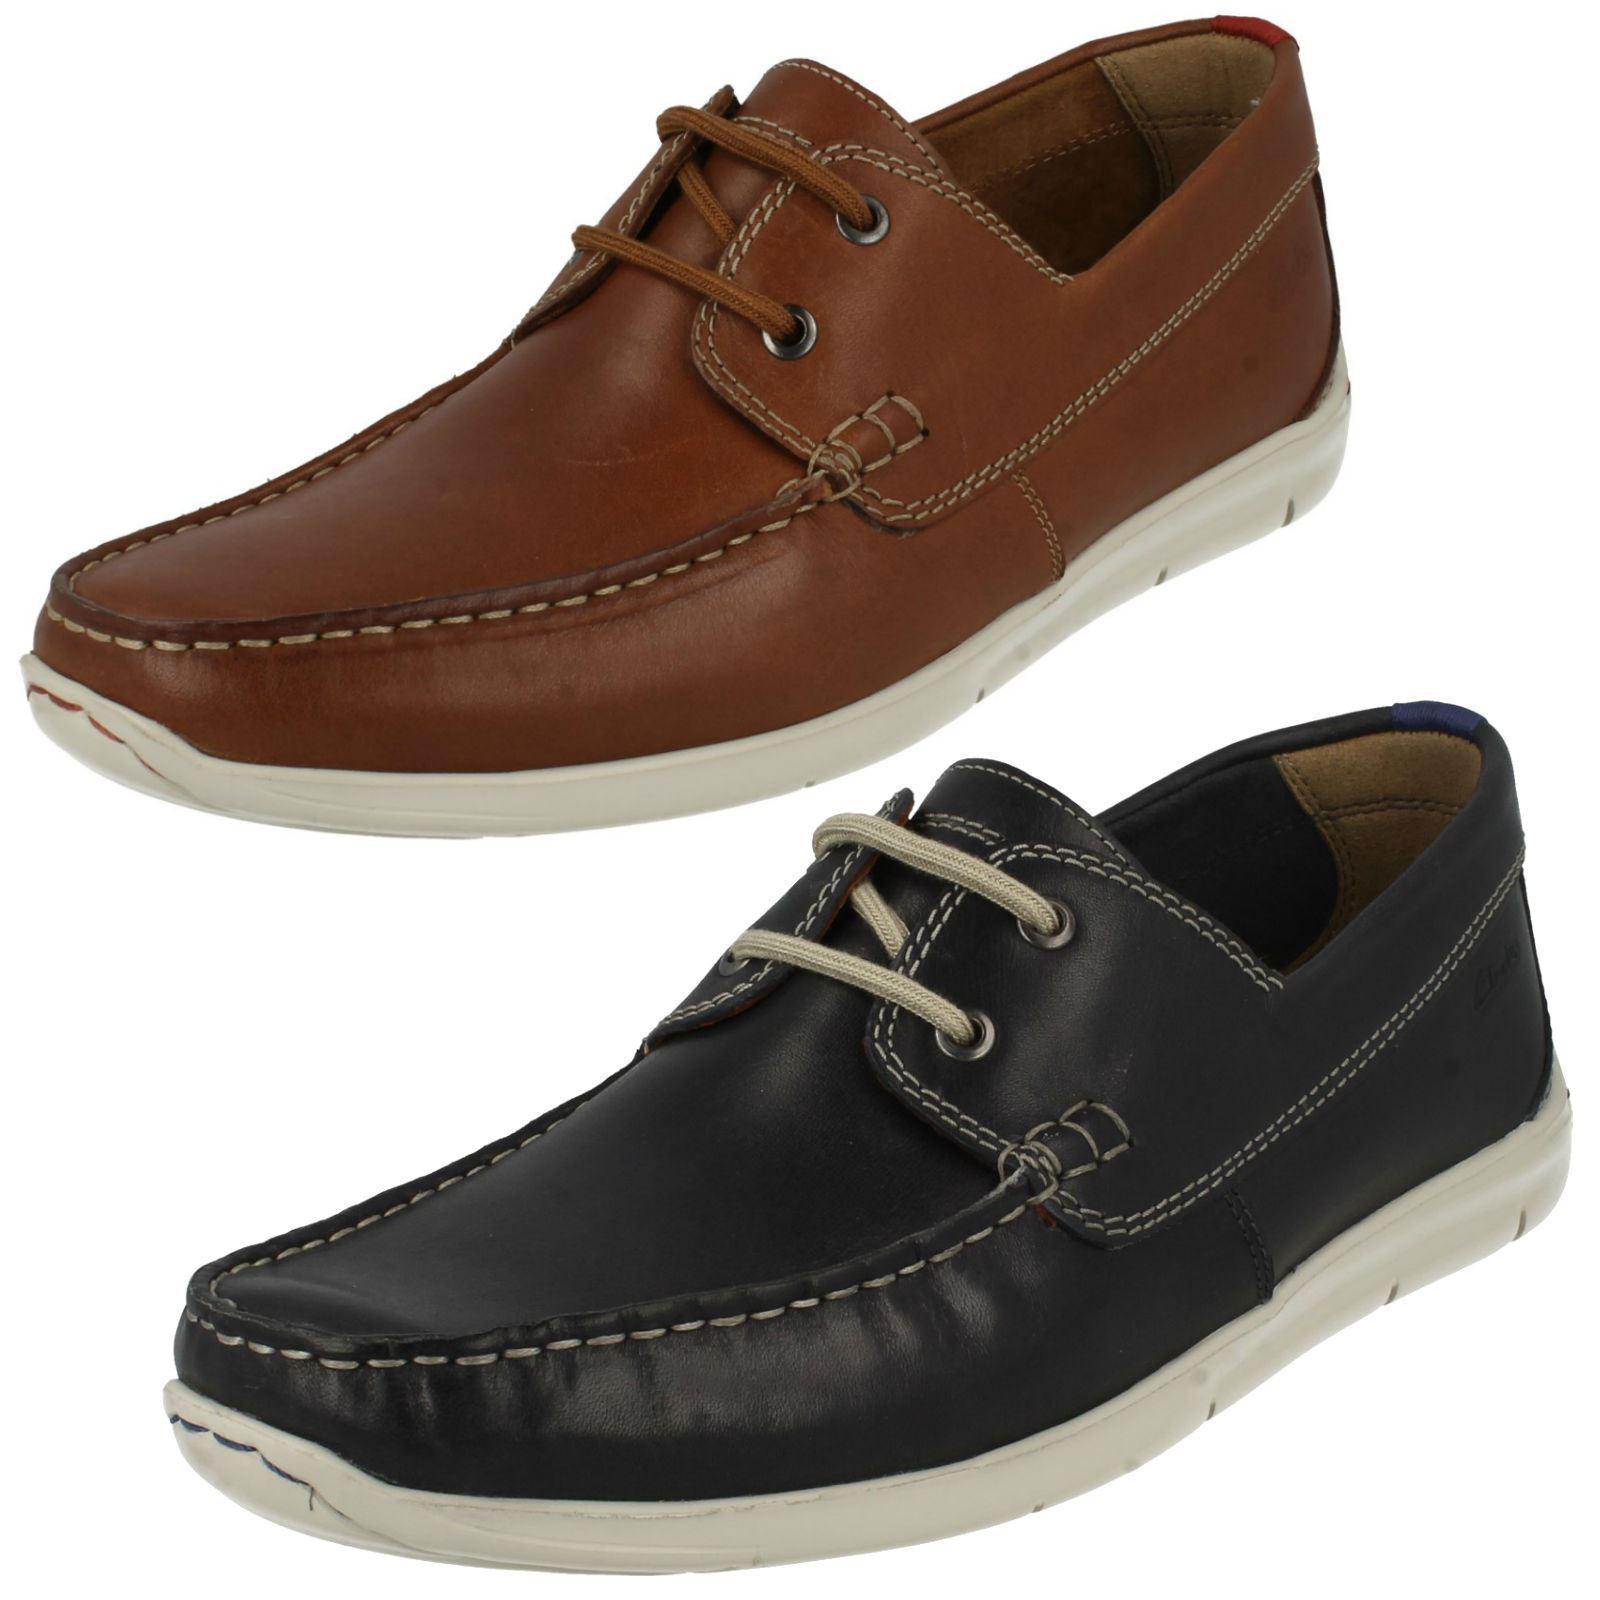 Herren Clarks Casual Step' Schuhes 'Karlock Step' Casual 0f01b3